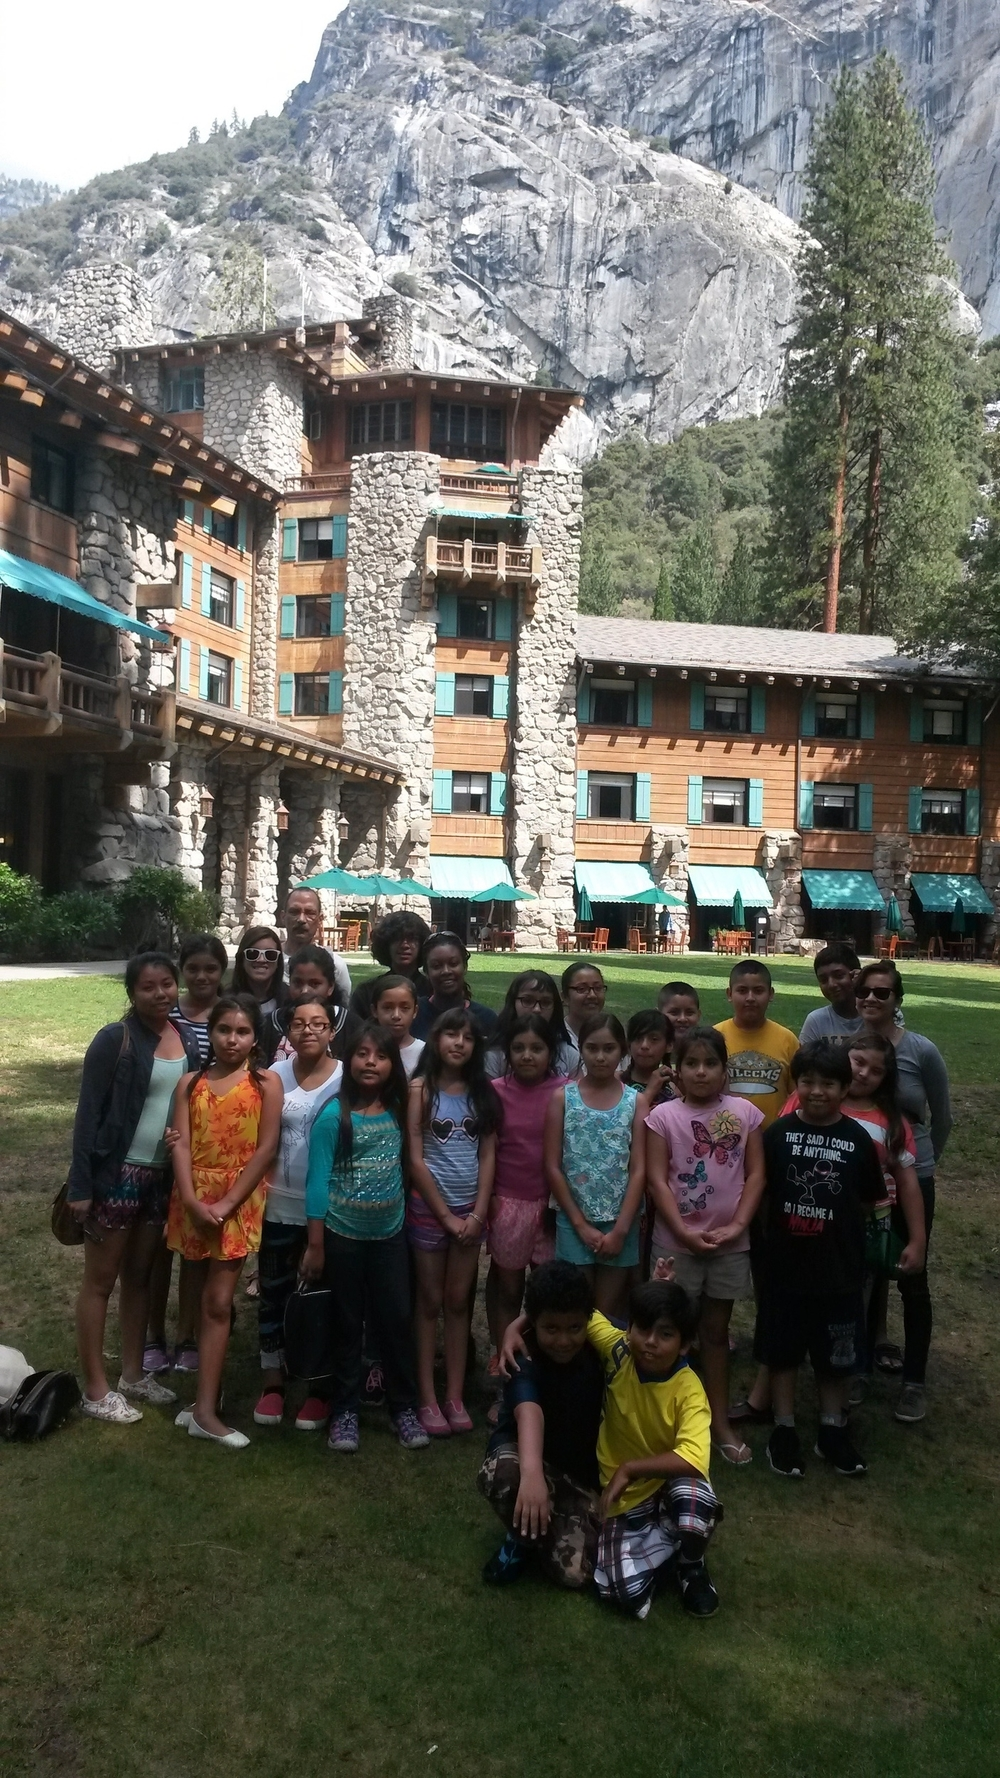 Kids in Yosemite July 2015.jpg